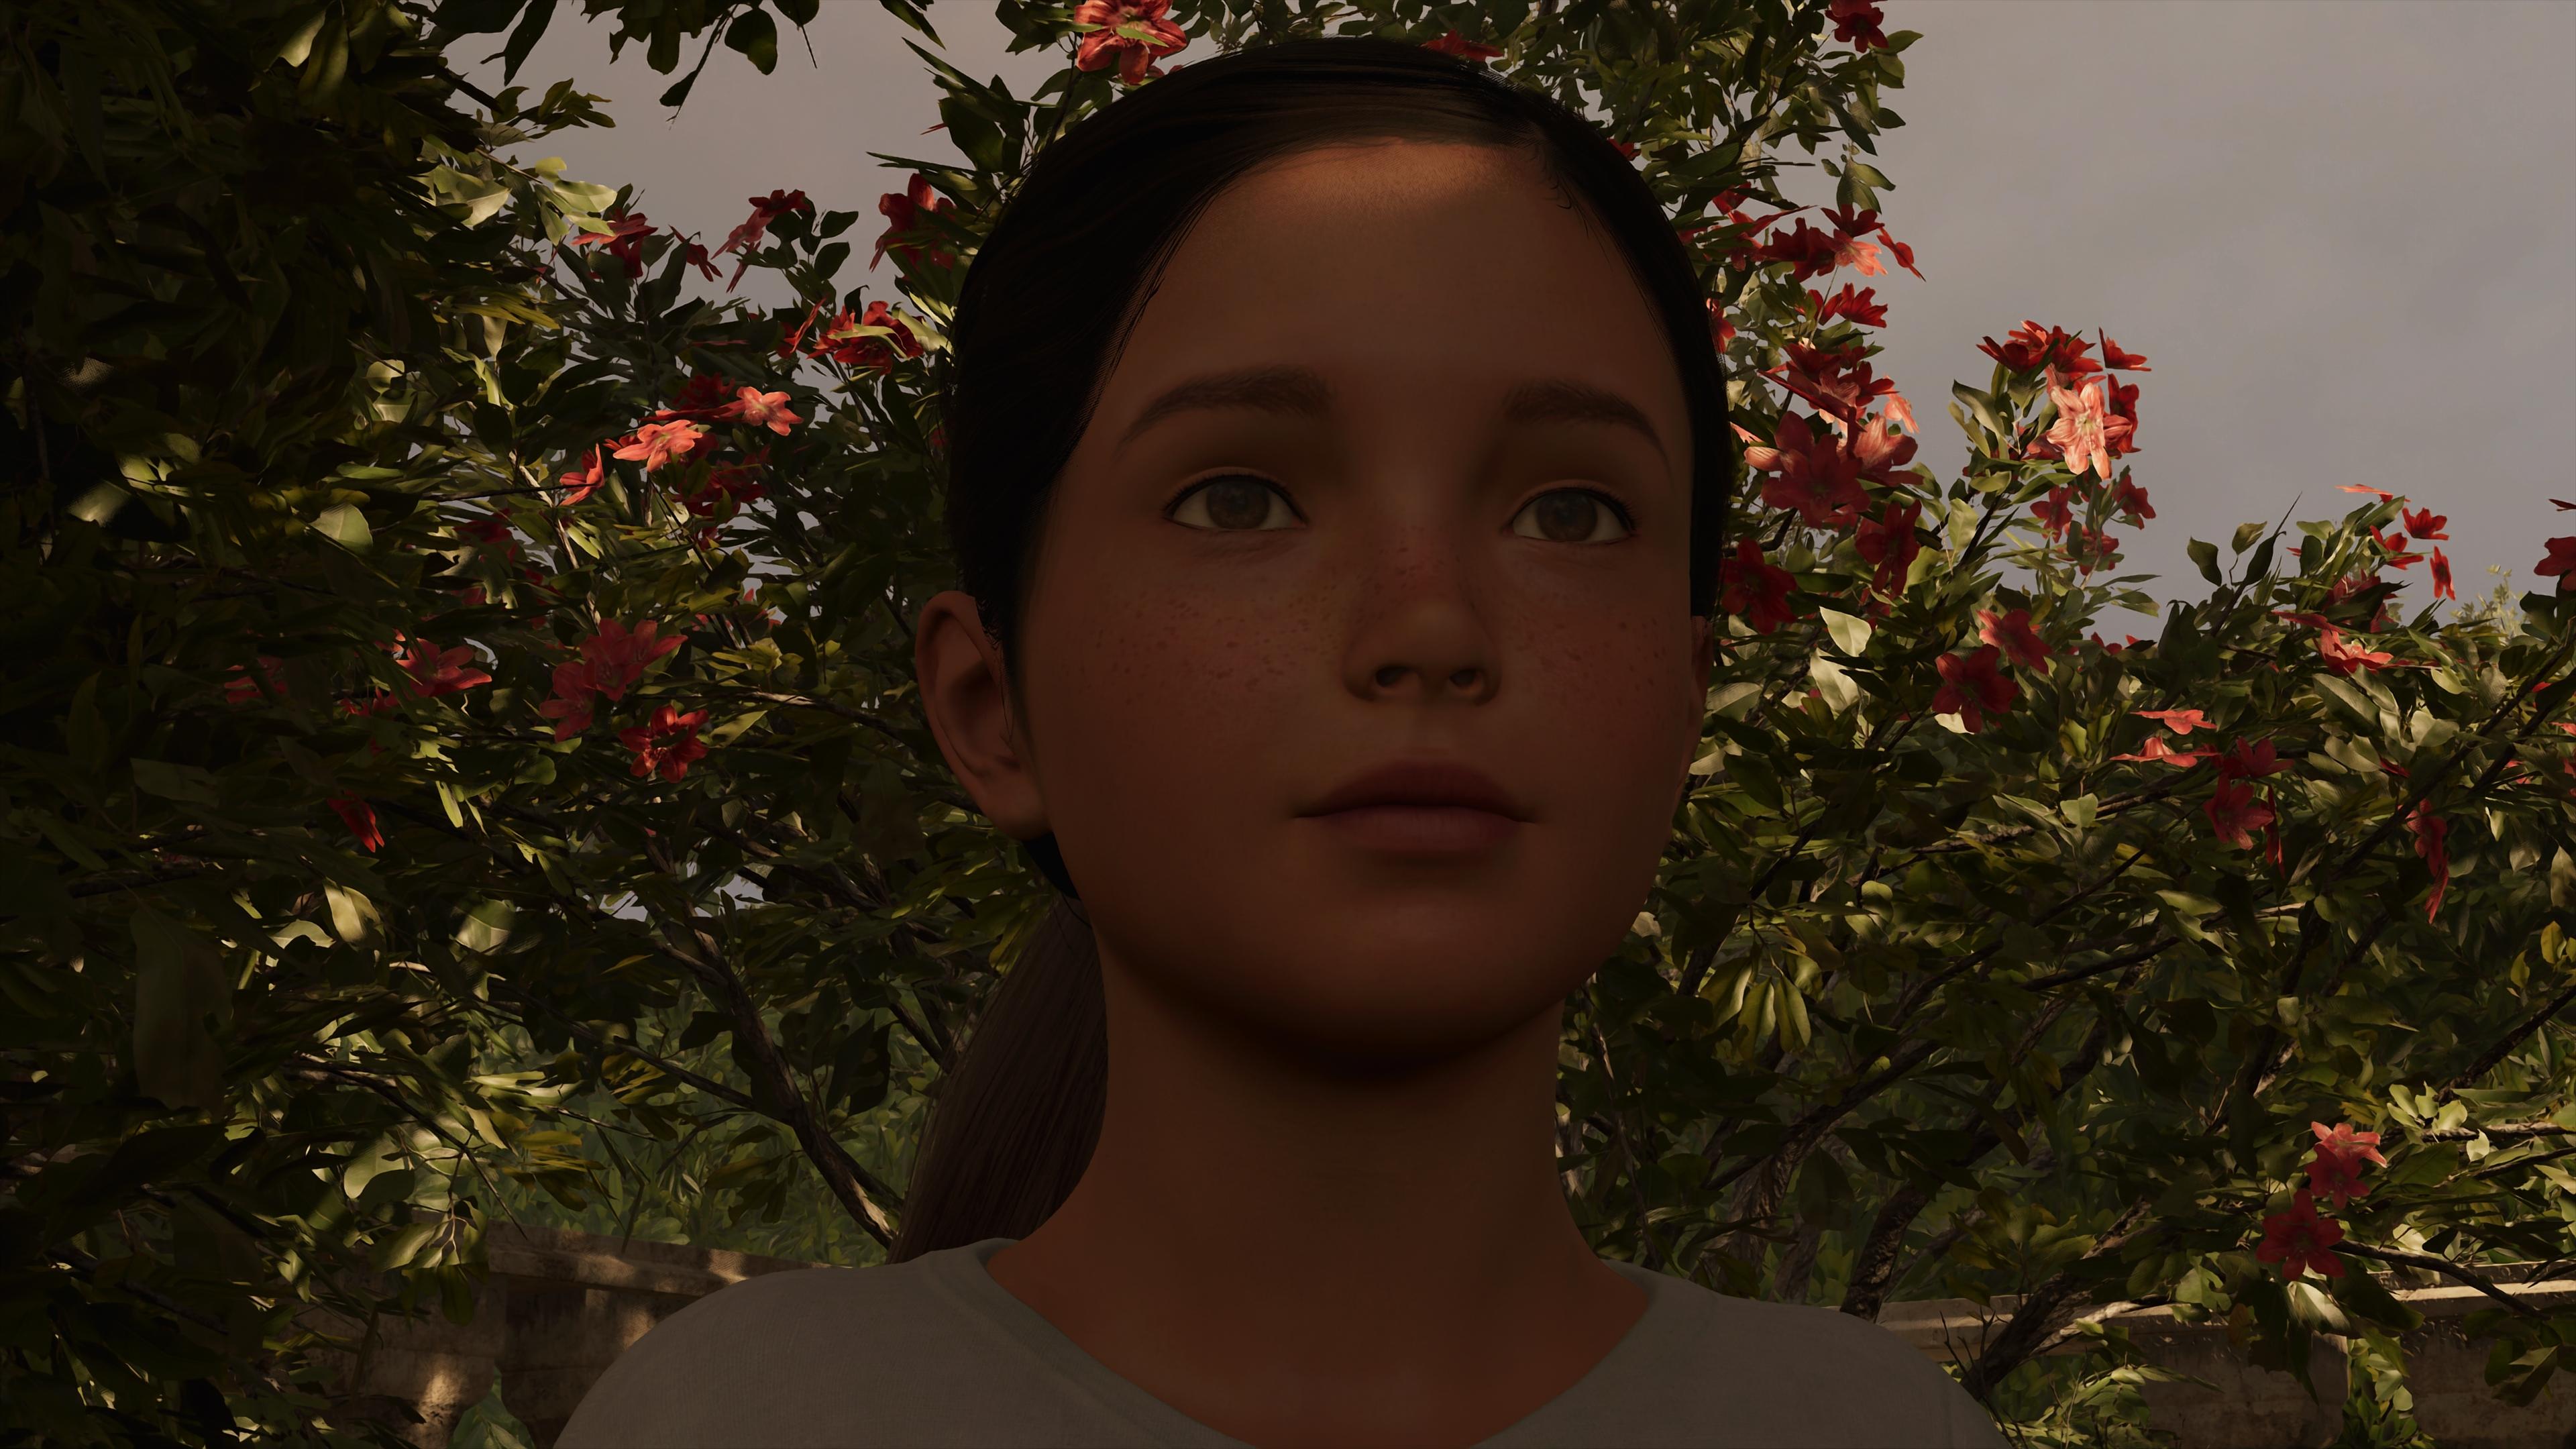 Shadow of the Tomb Raider скриншот с NVIDIA Ansel - Shadow of the Tomb Raider